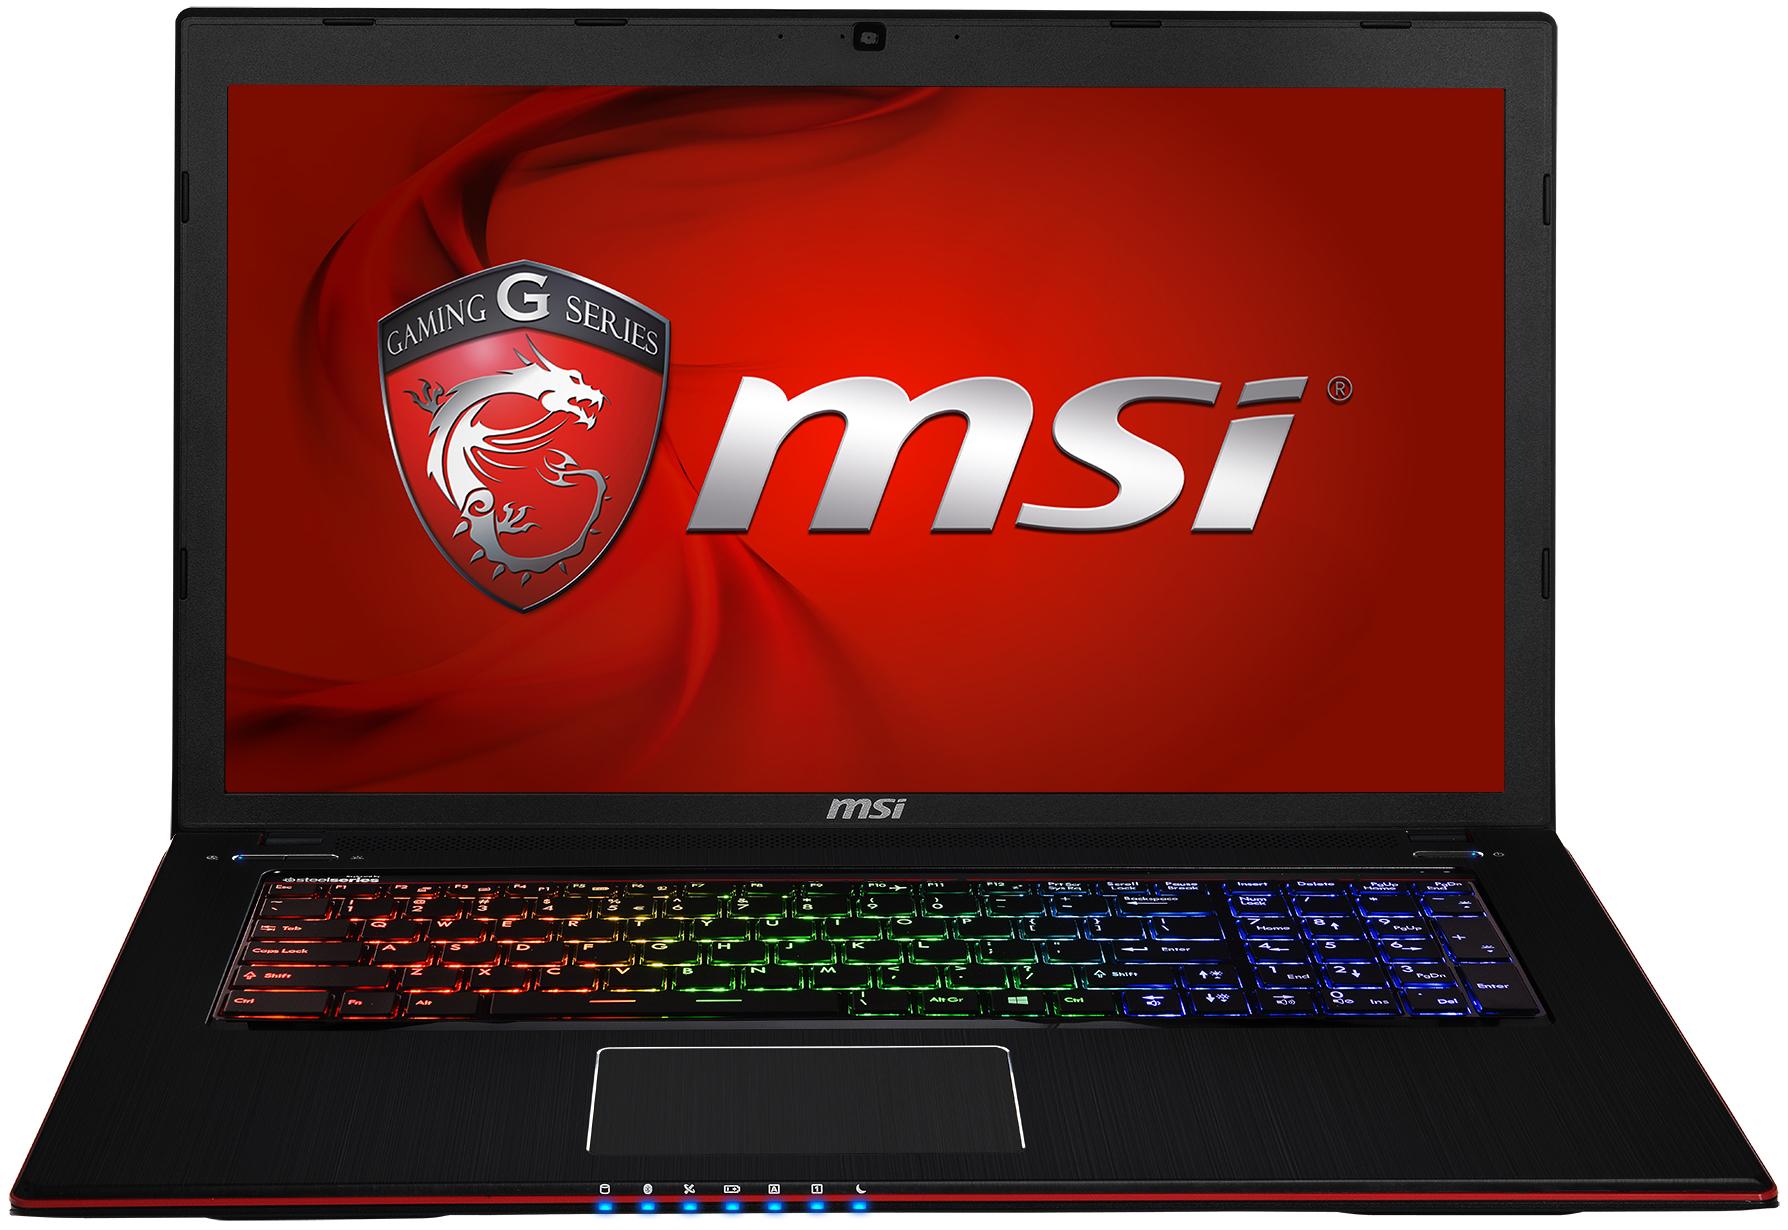 "Ноутбук MSI GE70 2QE Apache Pro MS-1759 17.3"", Intel Core i5-4210H 2.9GHz, 8Gb, 1Tb HDD (9S7-175912-876)"